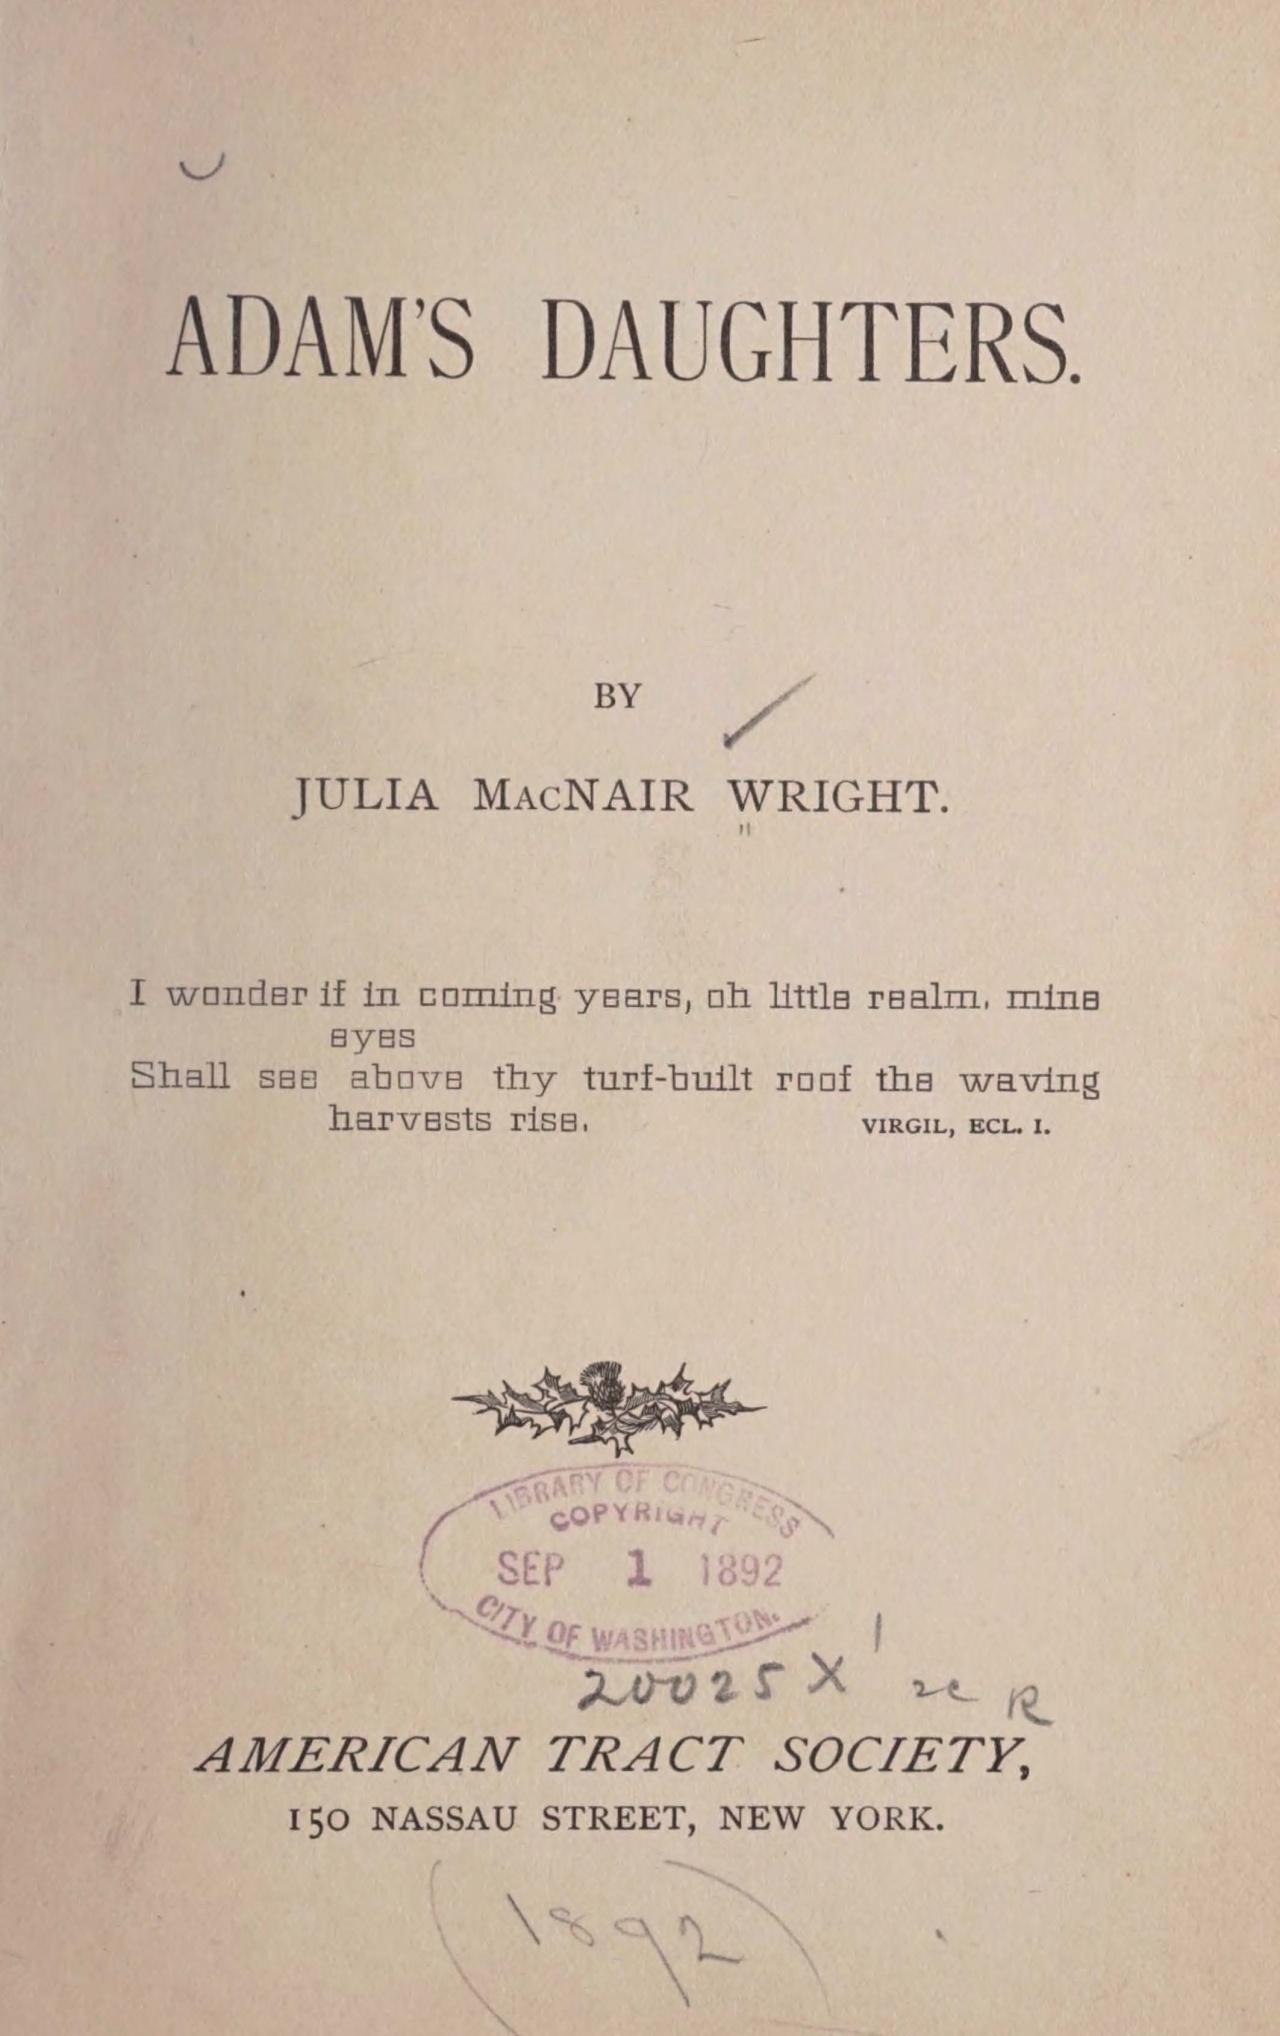 Wright, Julia McNair, Adam's Daughters Title Page.jpg